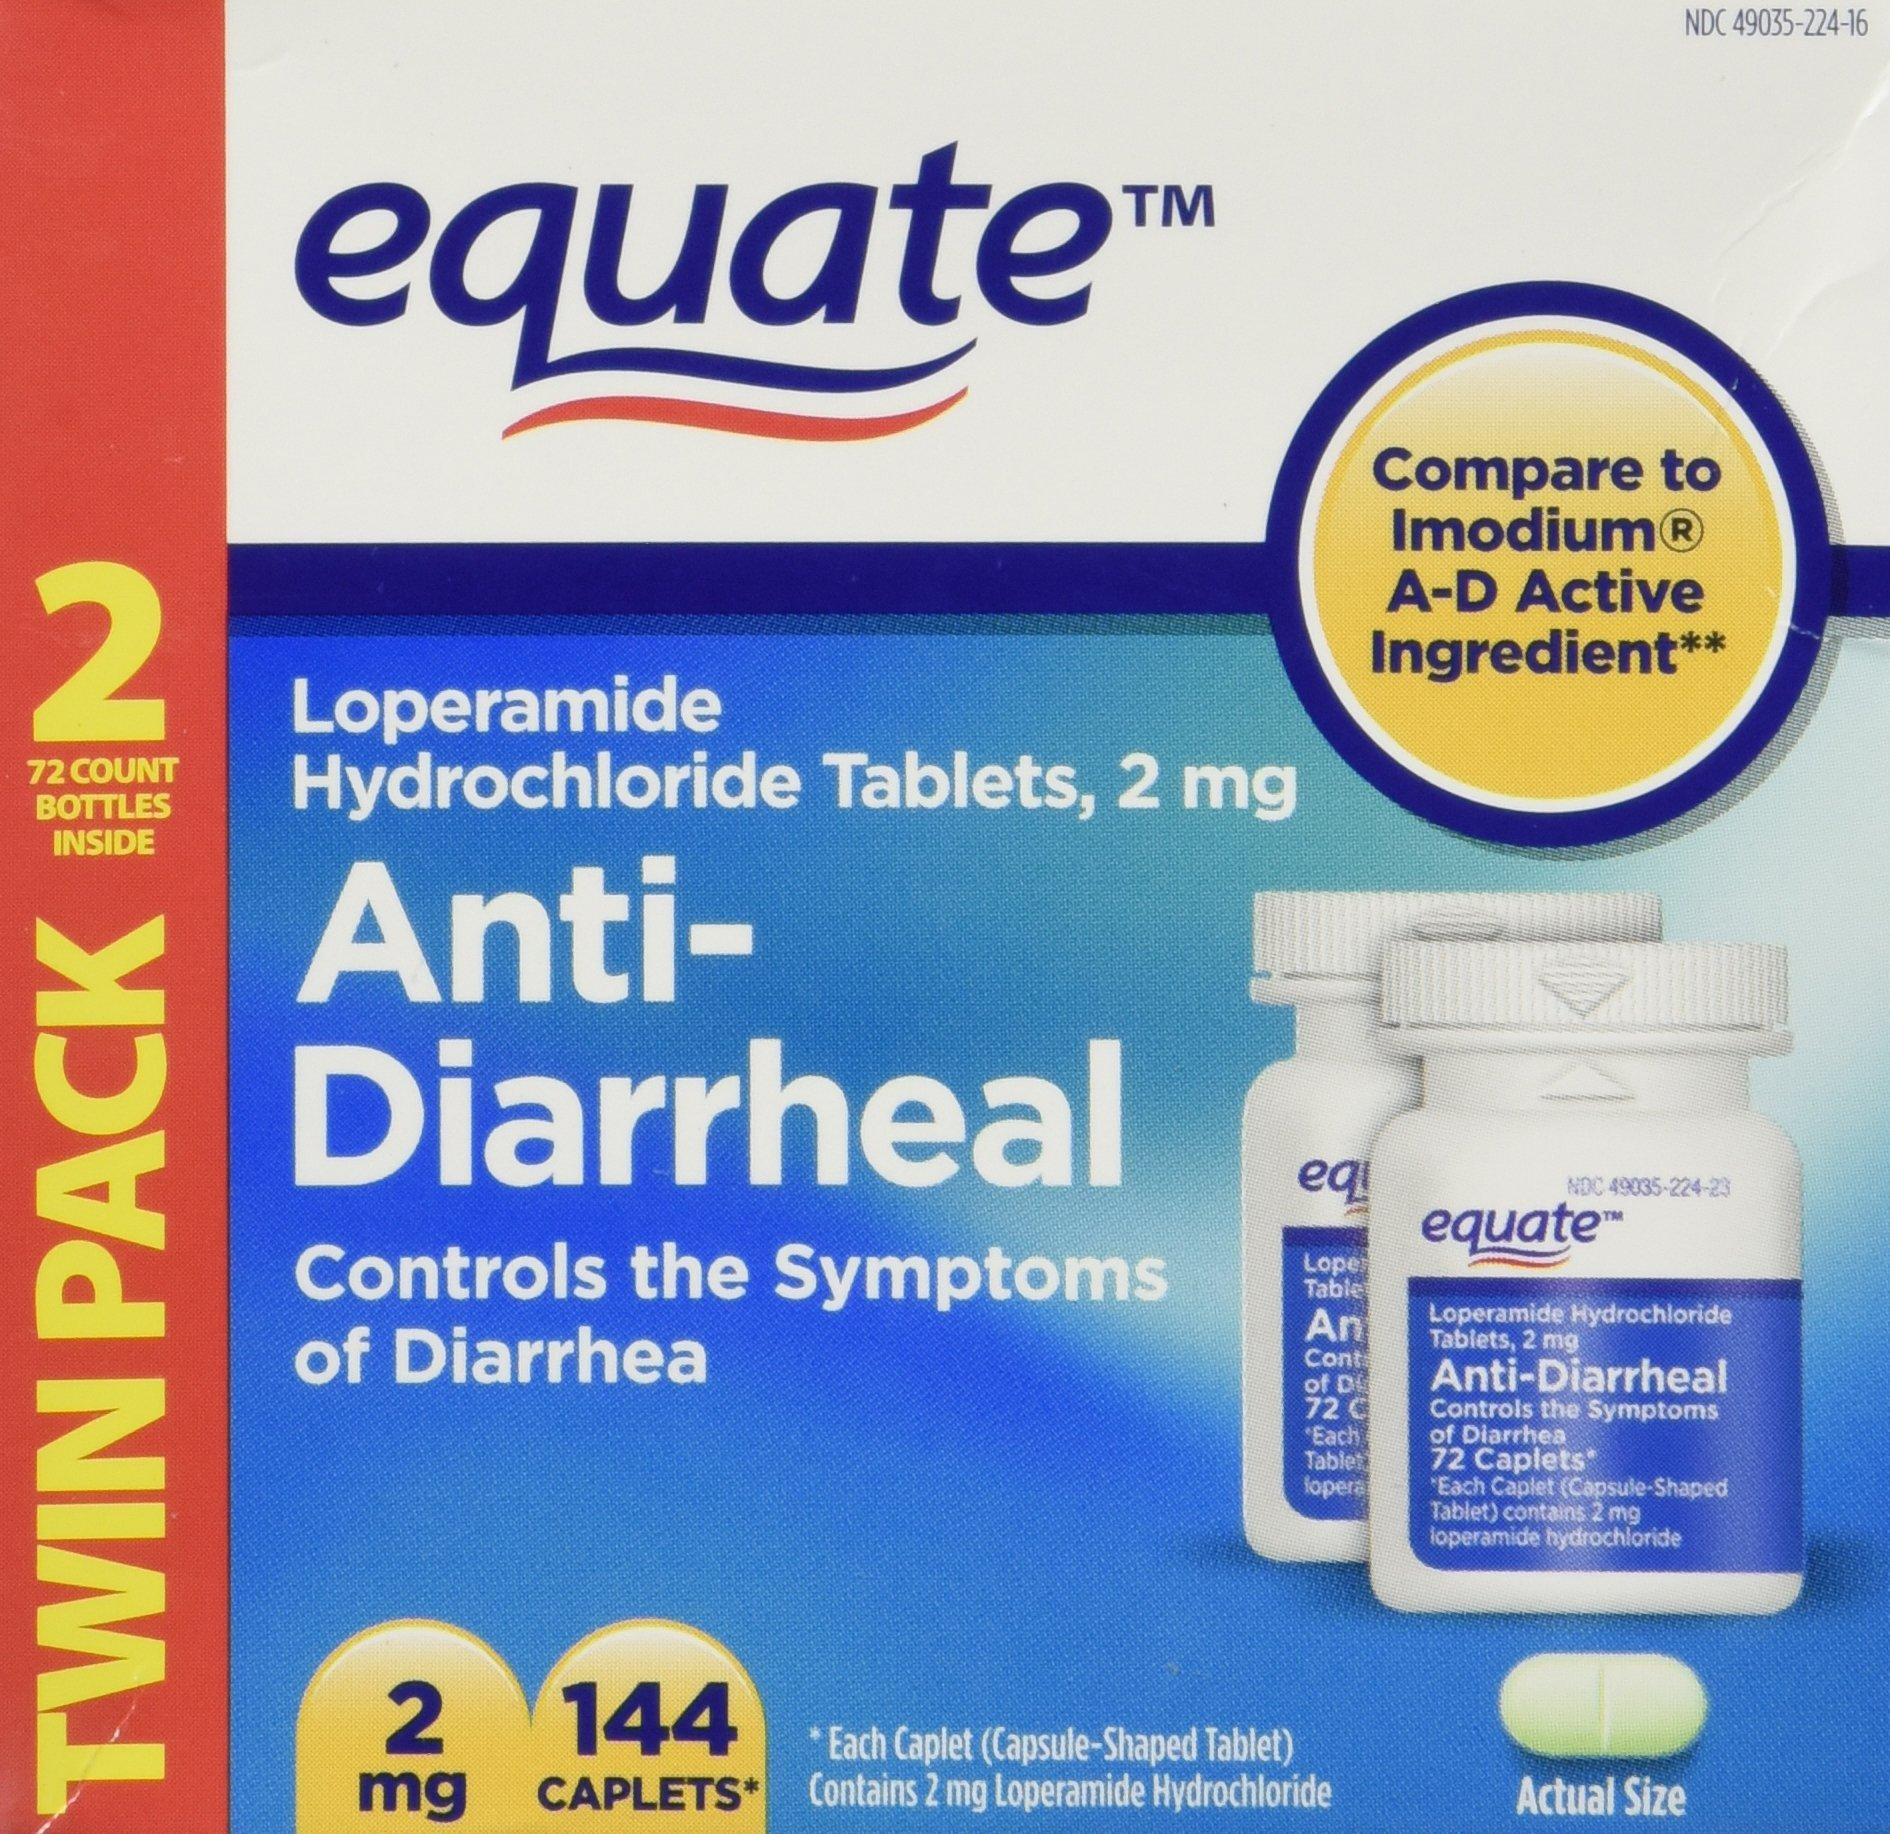 Equate - Anti-Diarrheal, Loperamide 2 mg, 144 Caplets (Compare to Imodium A-D)